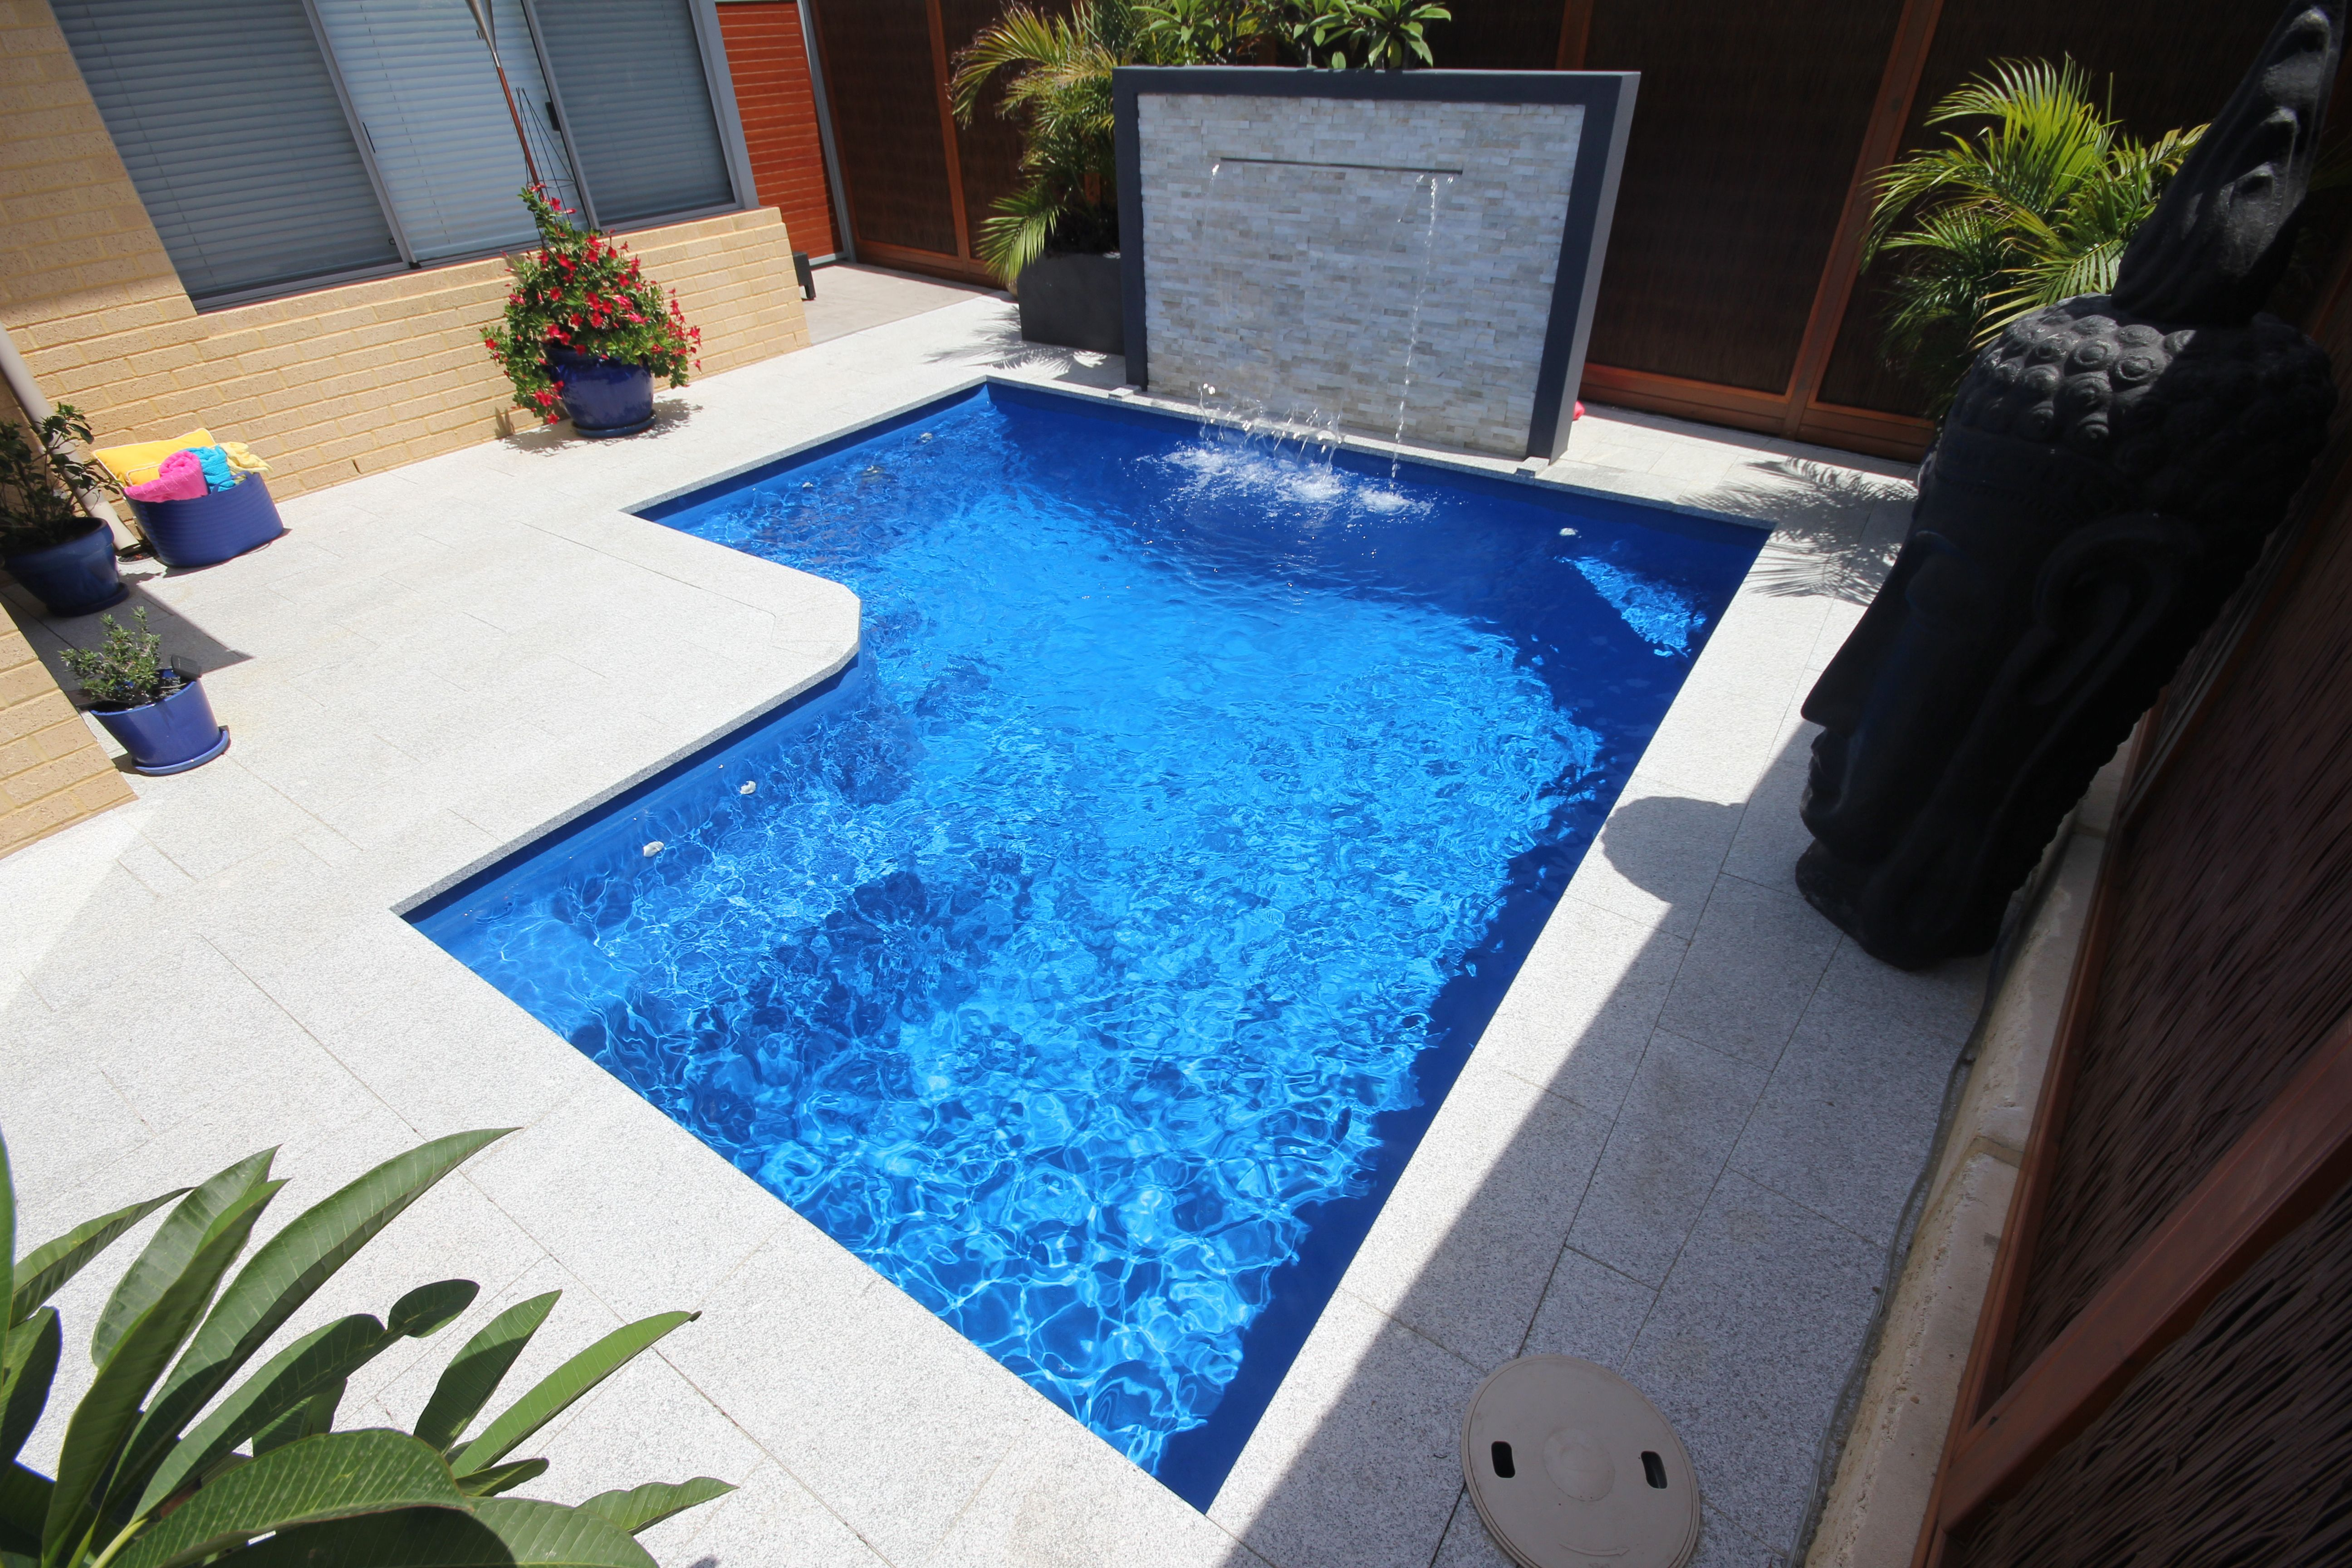 Alfresco - 4.4m x 4.4m, 1.5m constant depth | soph pool | Pinterest ...